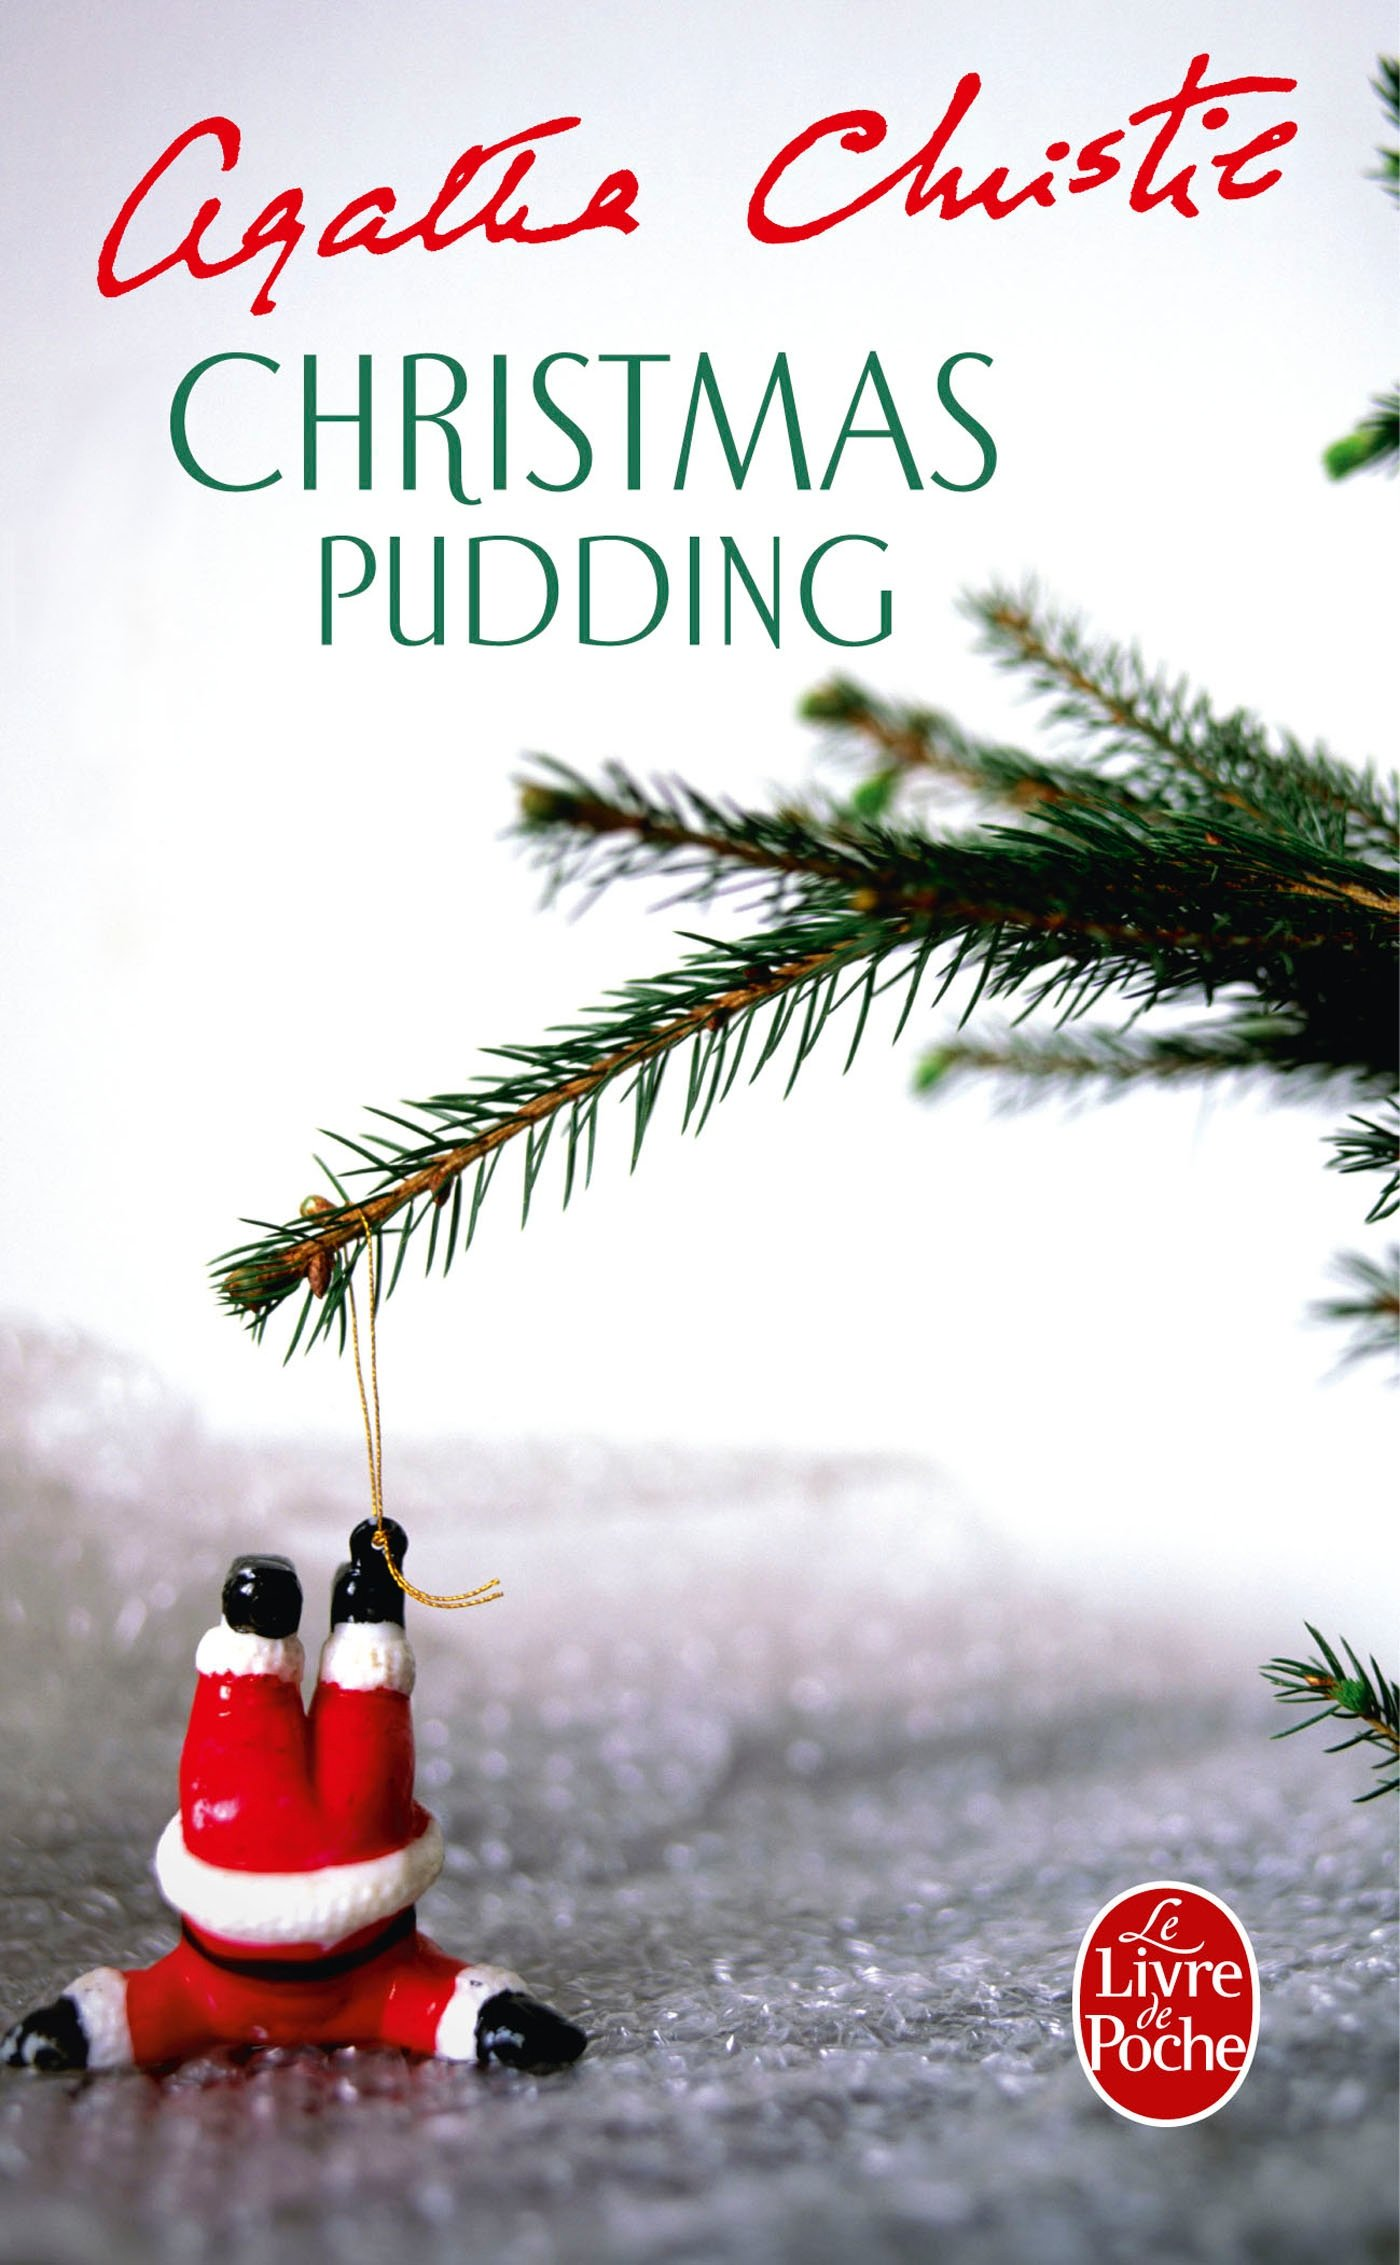 christmas-pudding-ldp-christie